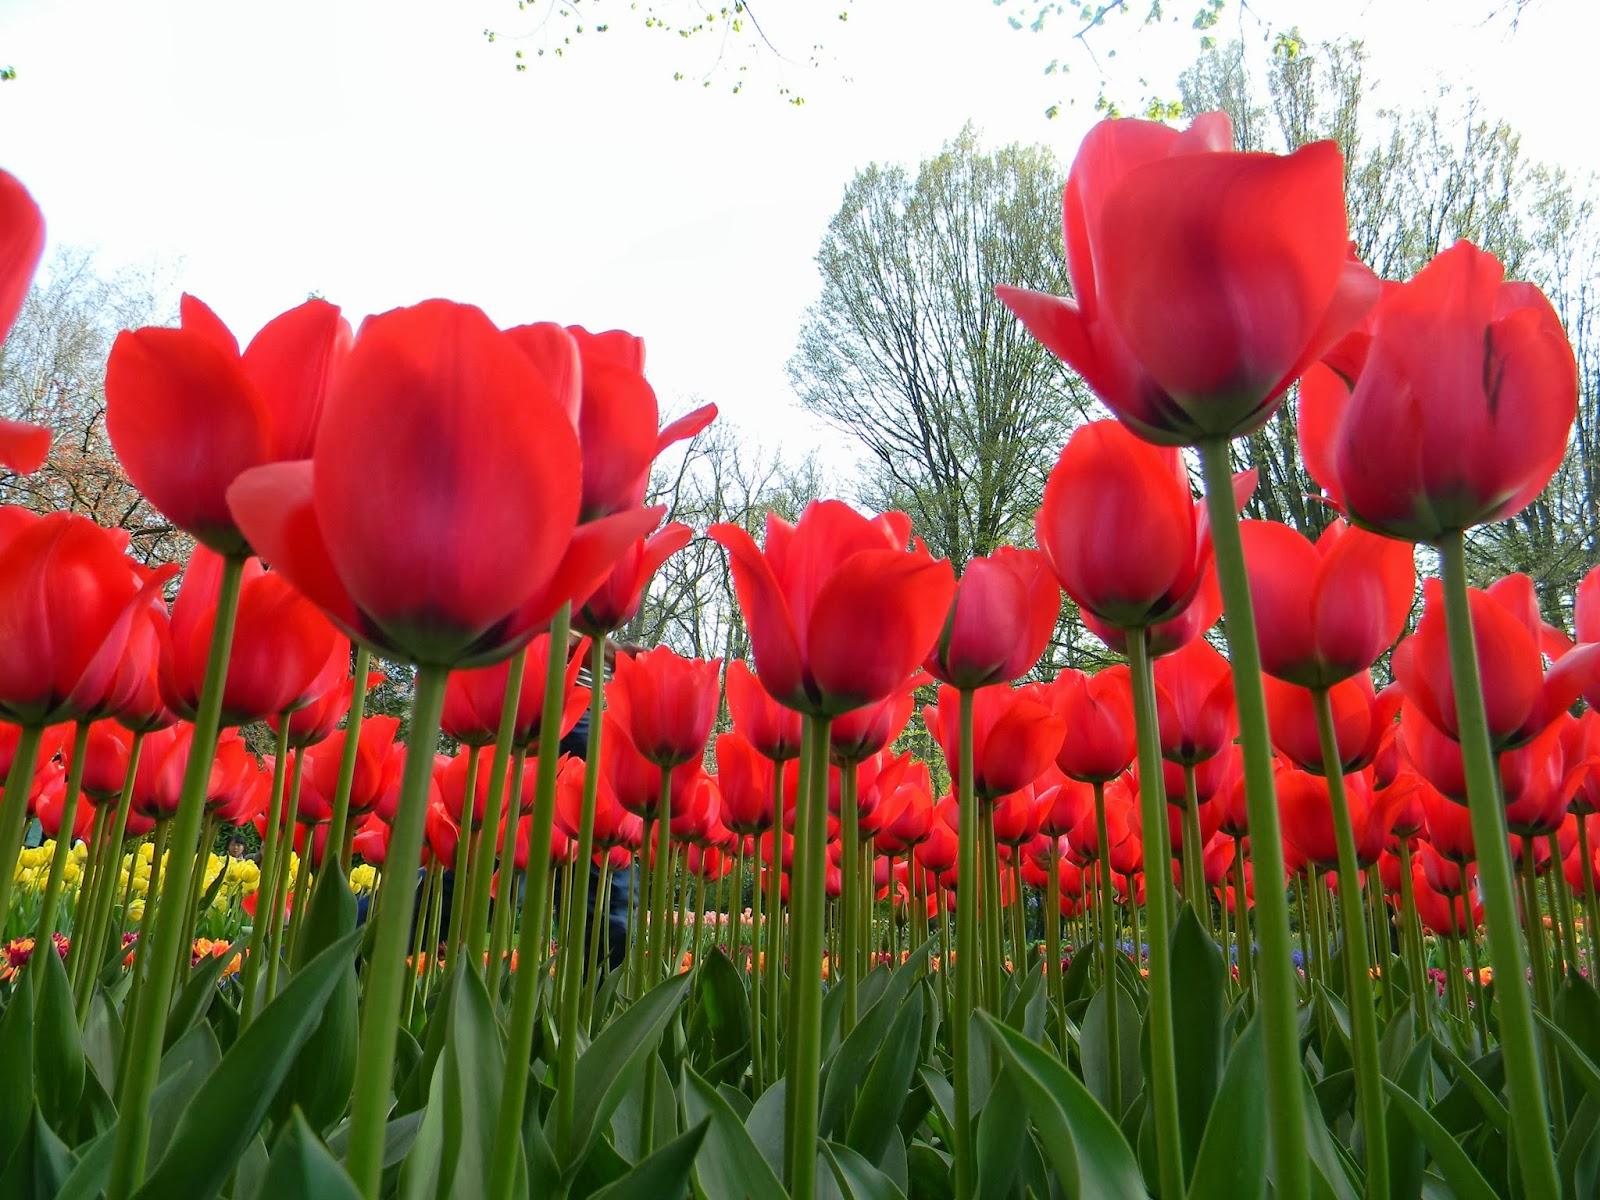 Bunga Tulip Ungu Related Keywords - Bunga Tulip Ungu Long